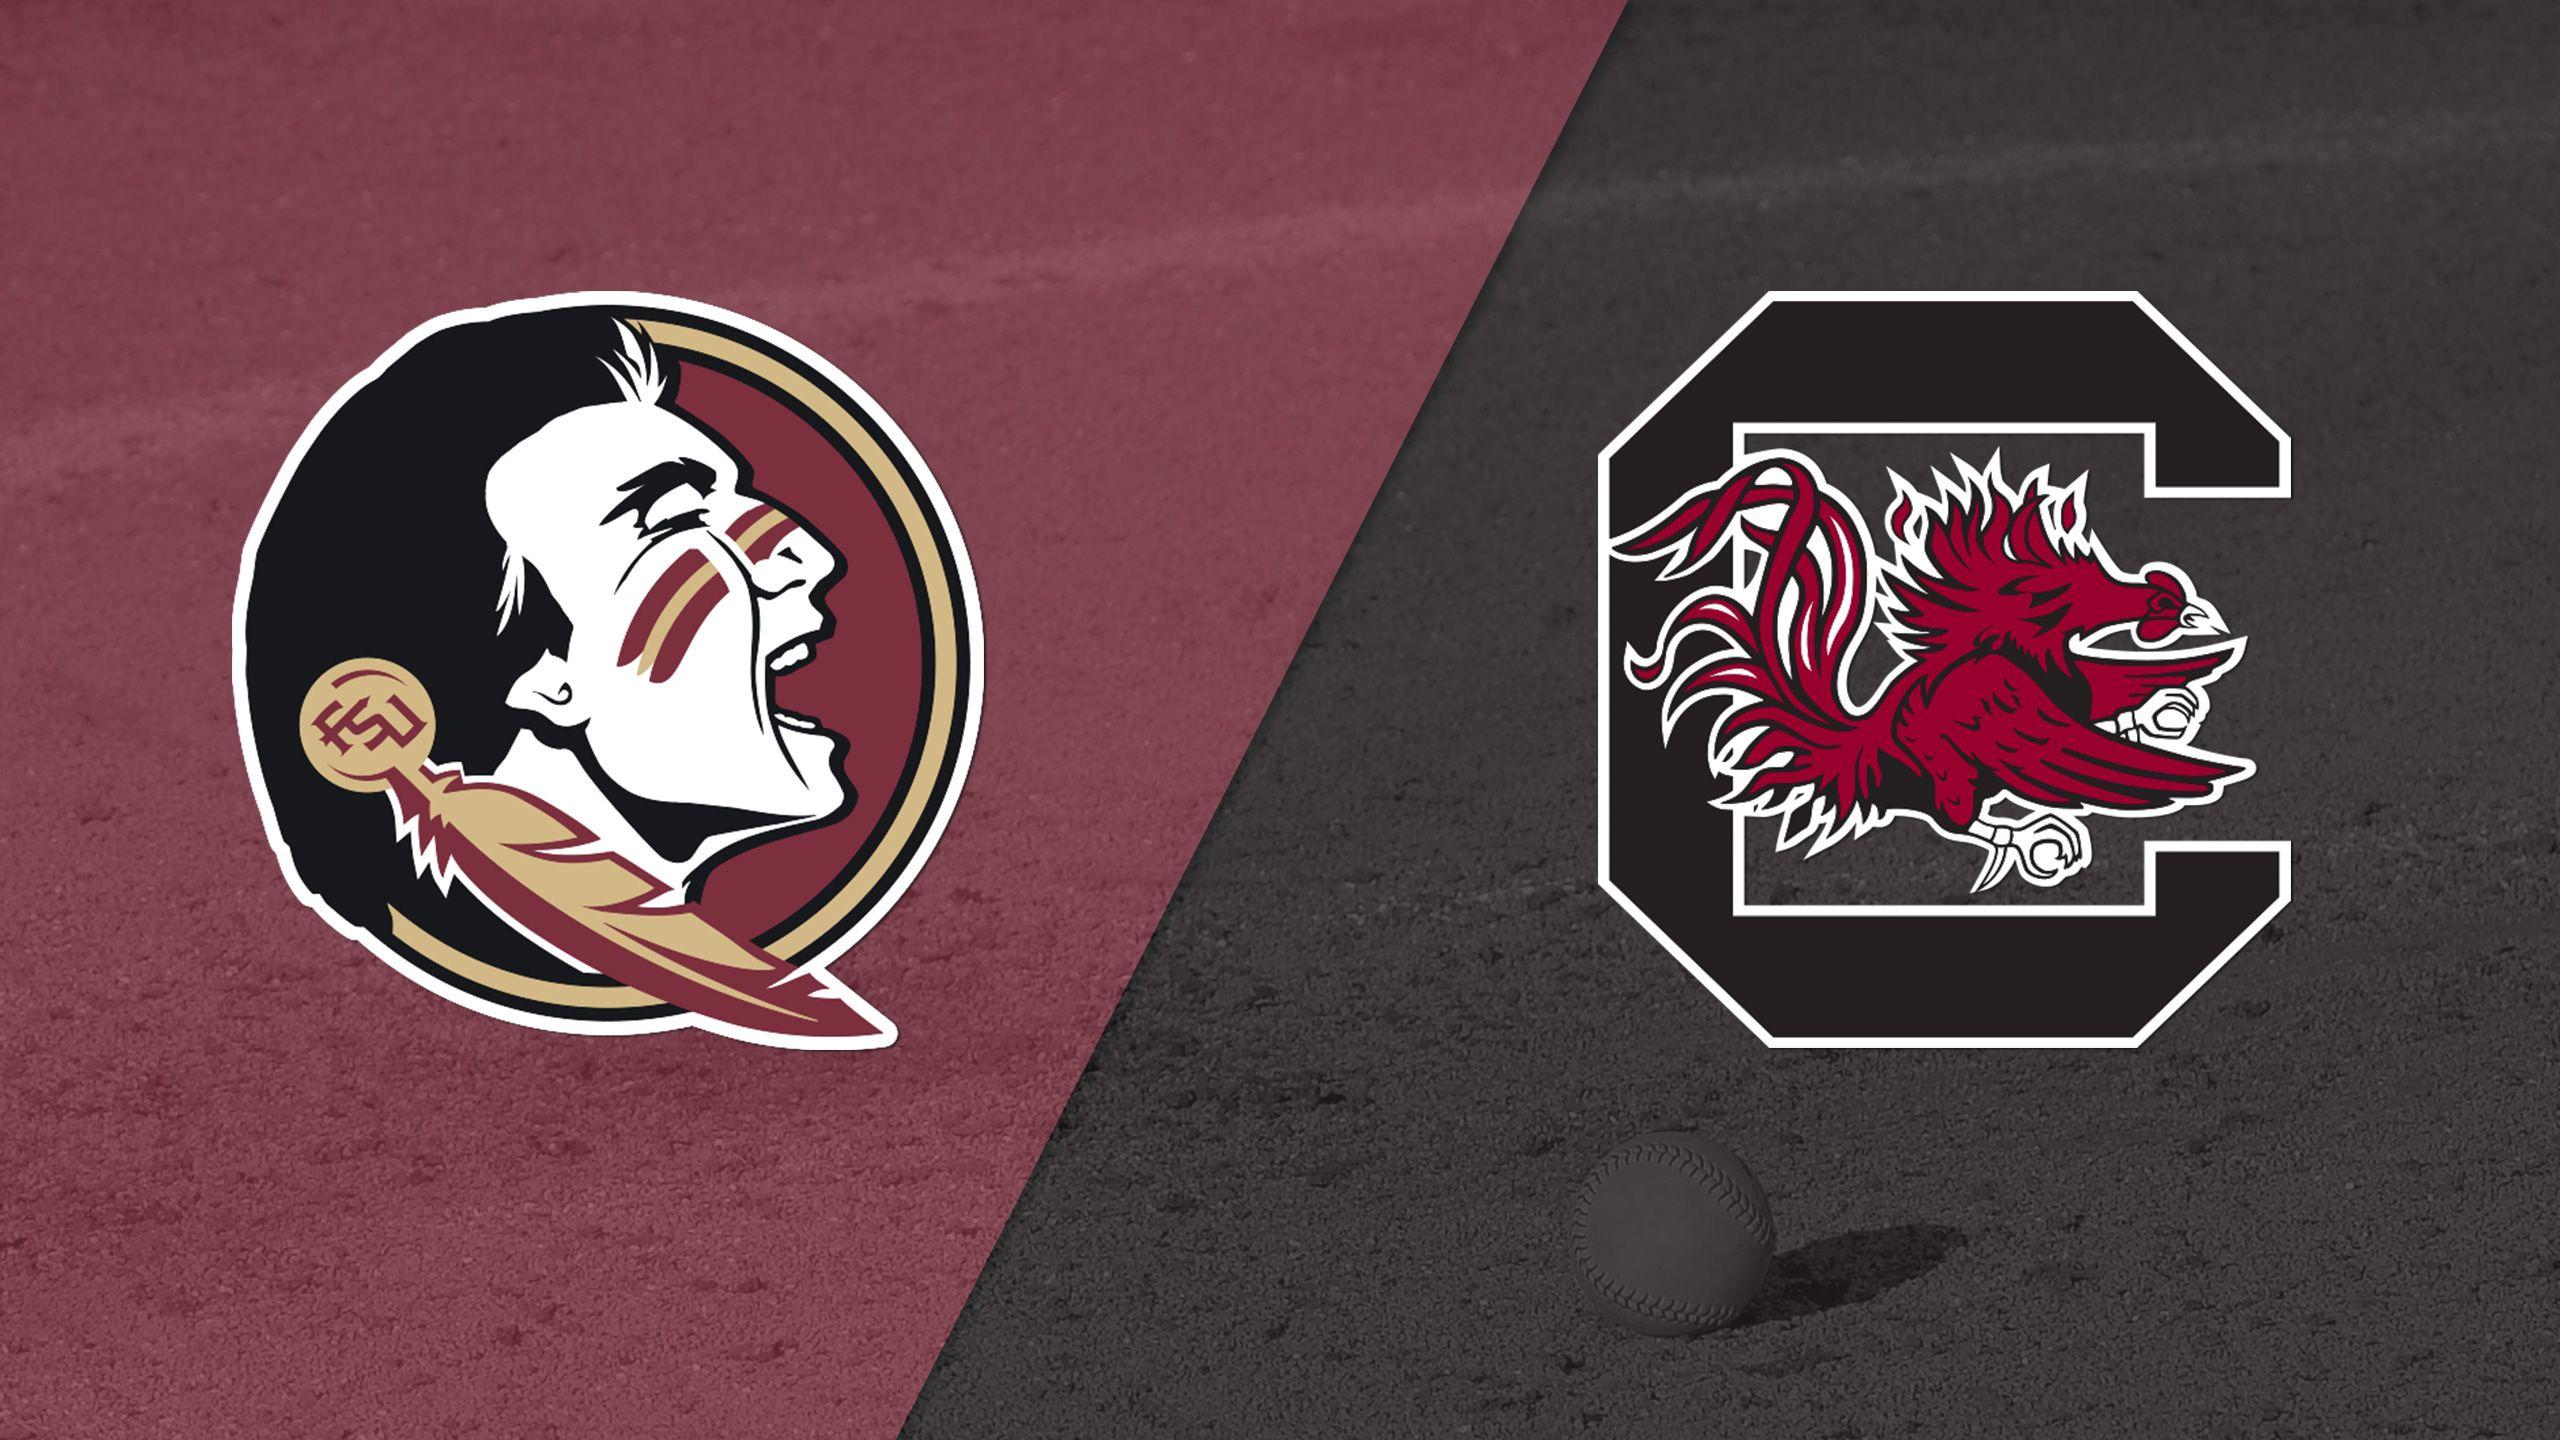 #2 Florida State vs. South Carolina (Softball)